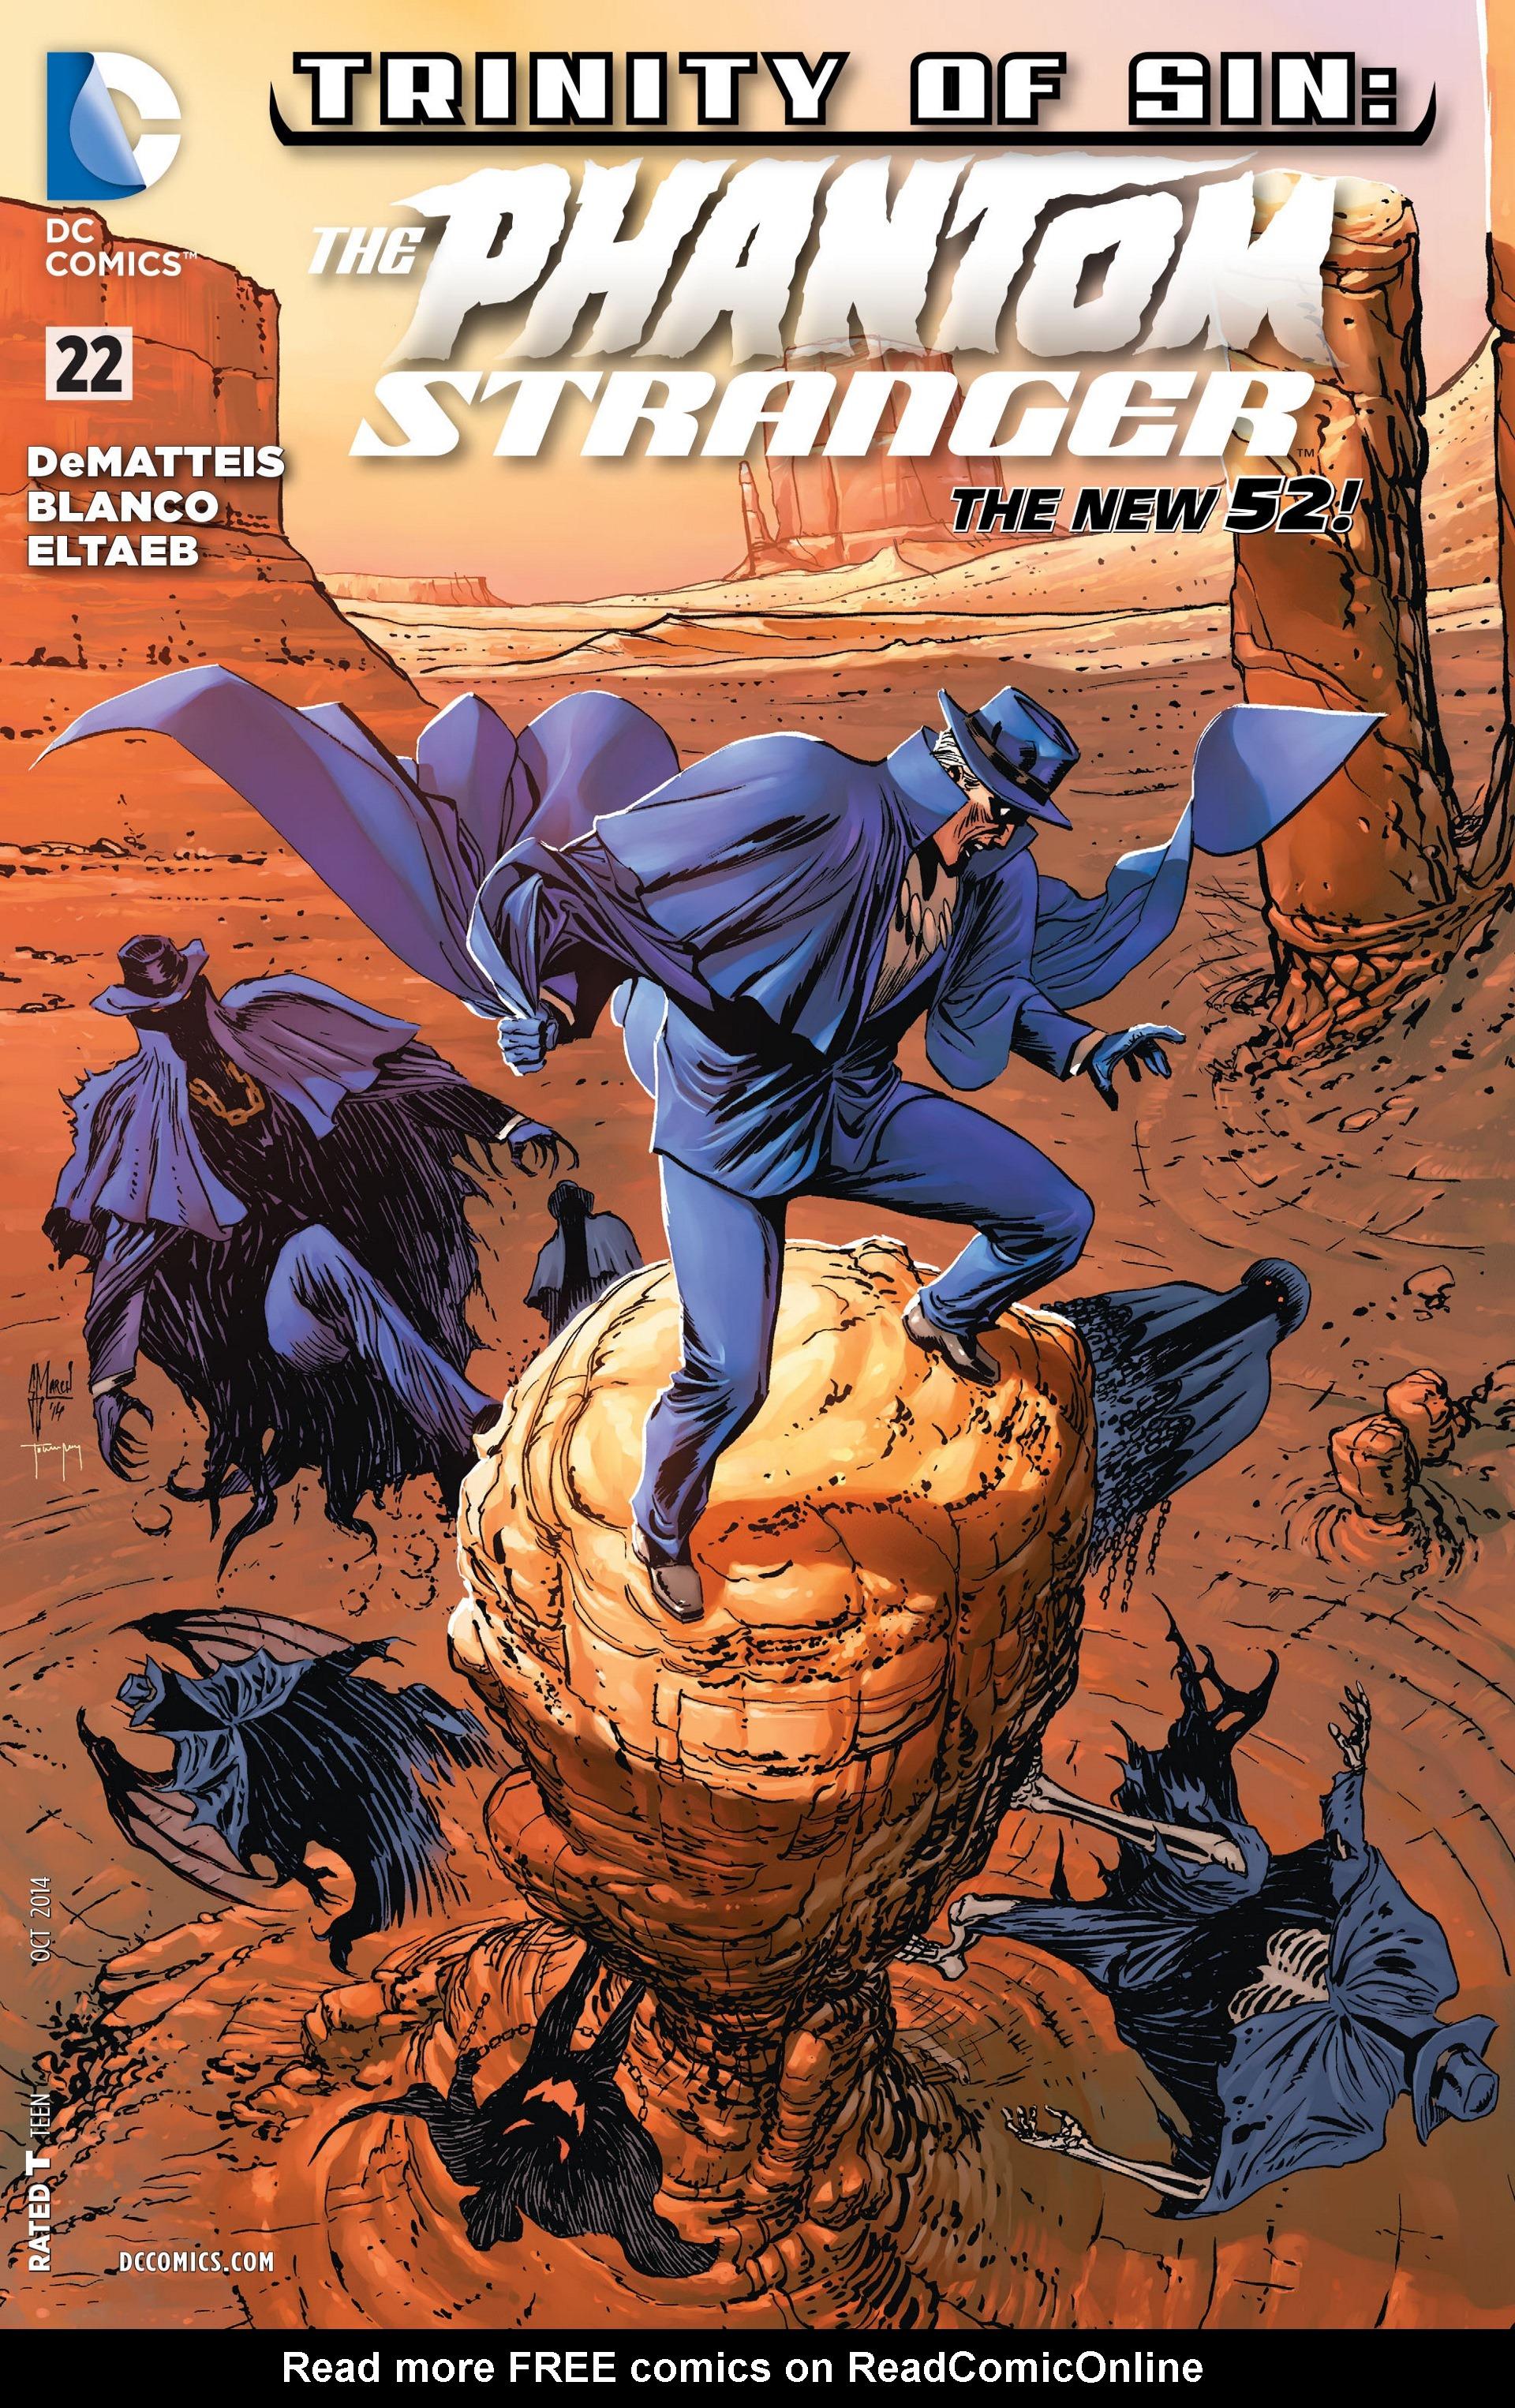 Read online Trinity of Sin: The Phantom Stranger comic -  Issue #22 - 1